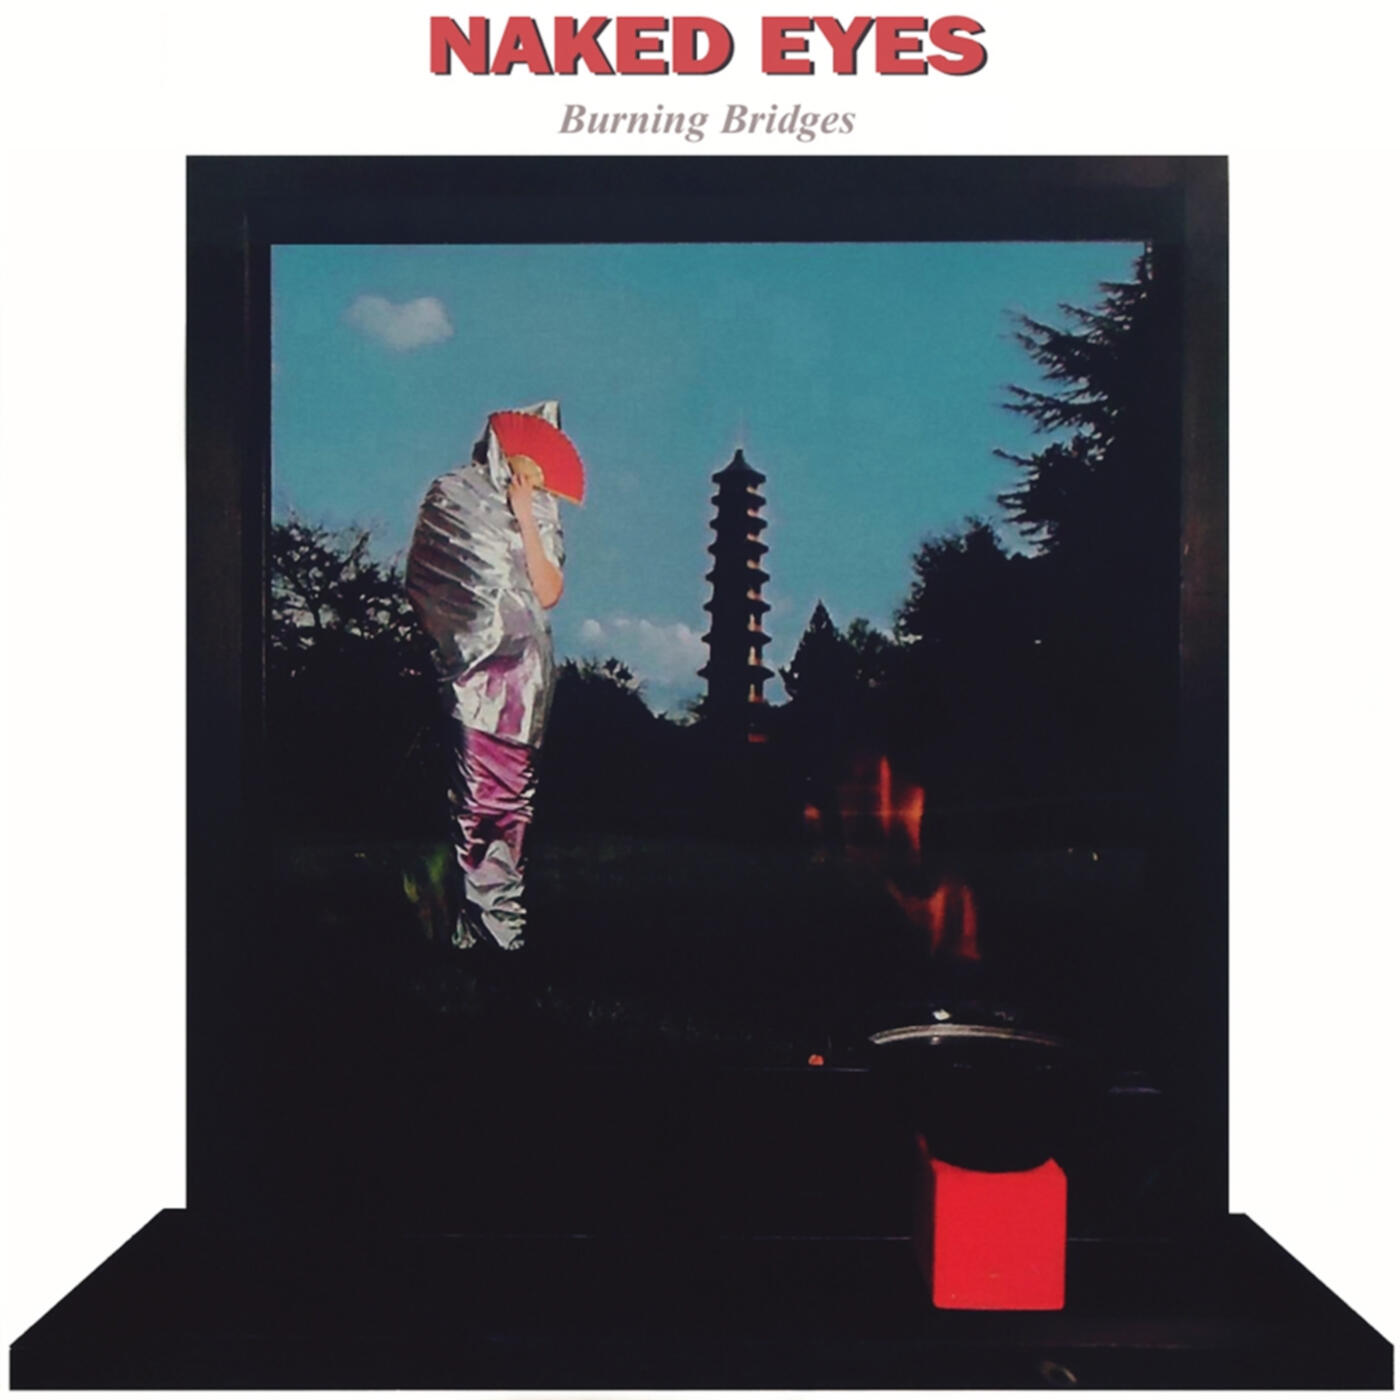 Naked Eyes - Burning Bridges (1983, Vinyl) - Discogs